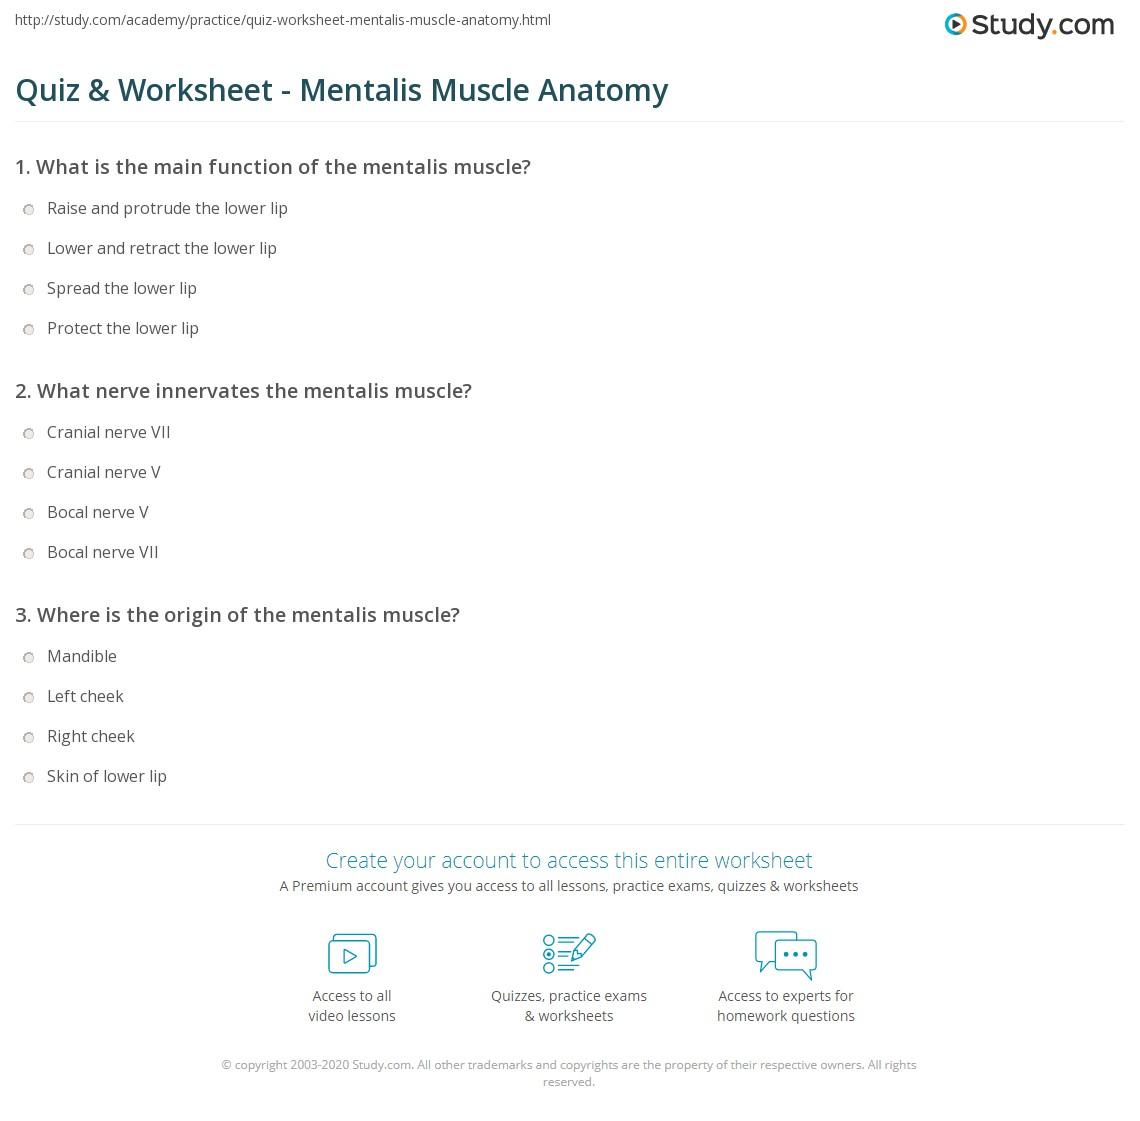 quiz worksheet mentalis muscle anatomy study com